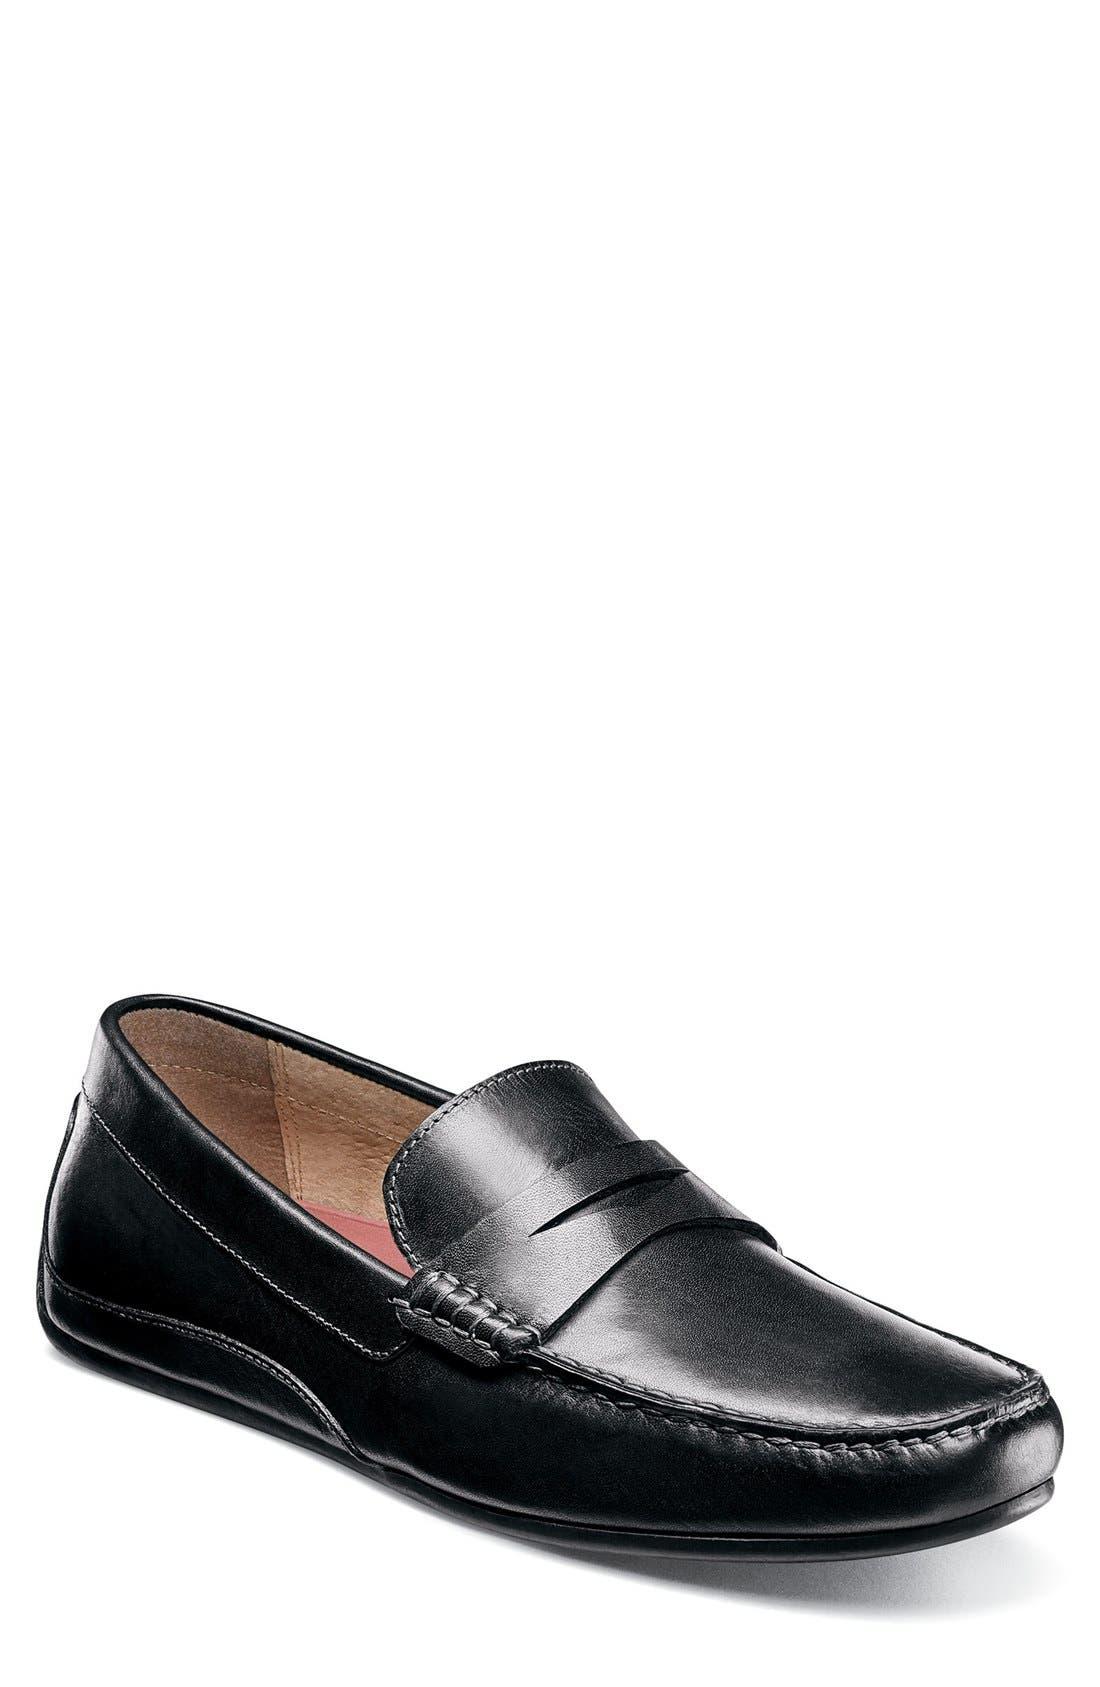 Florsheim Oval Driving Shoe (Men)